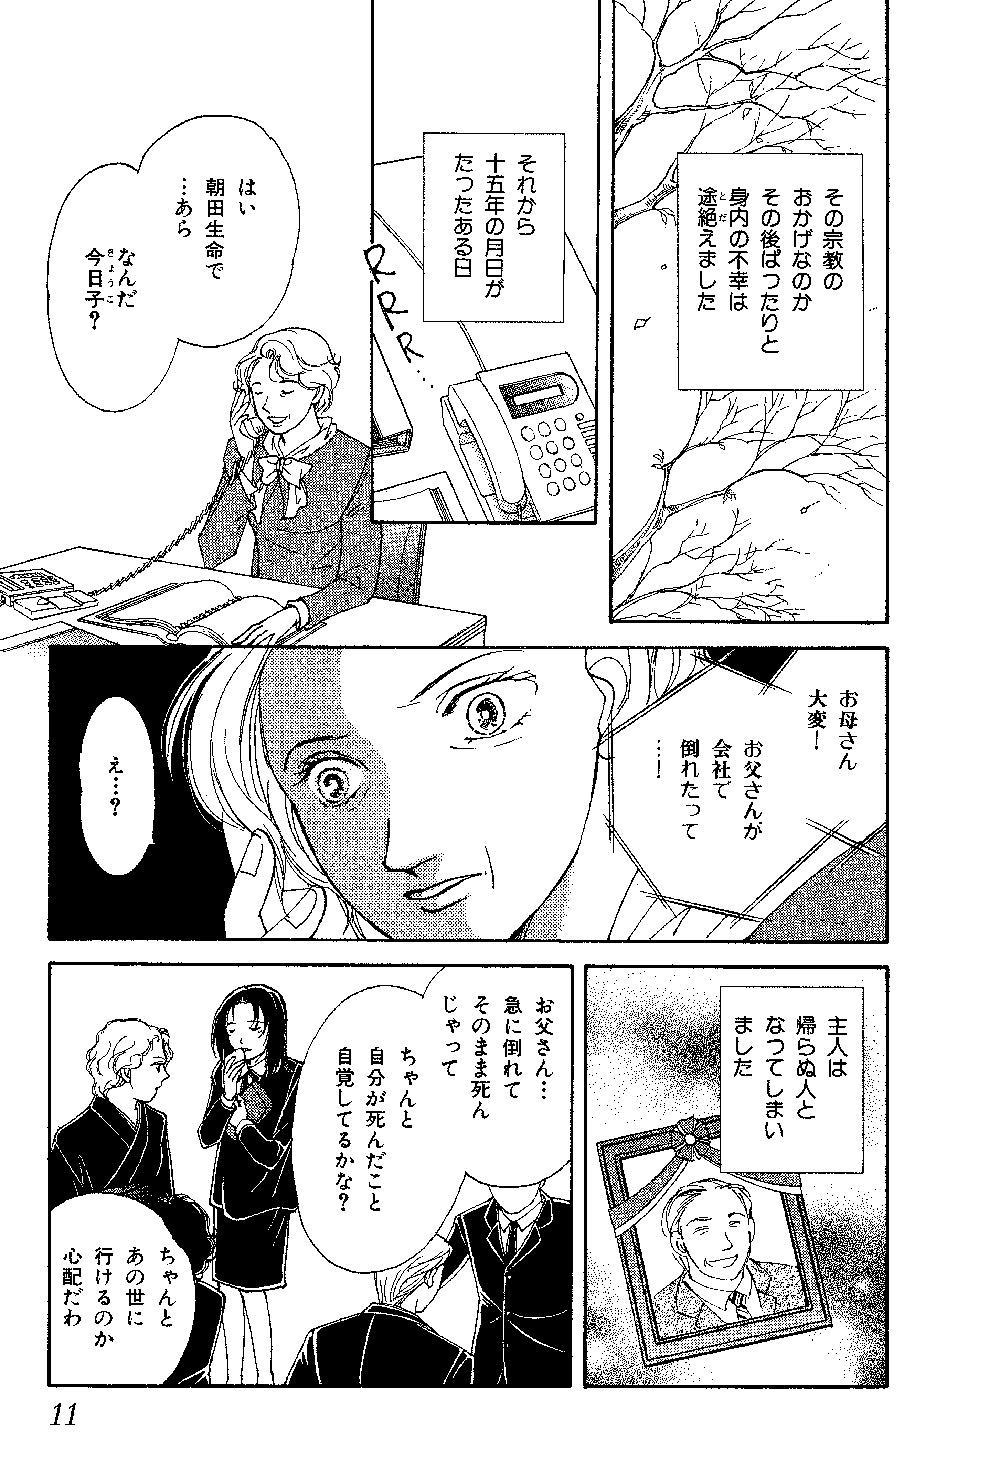 mayuri_0001_0011.jpg